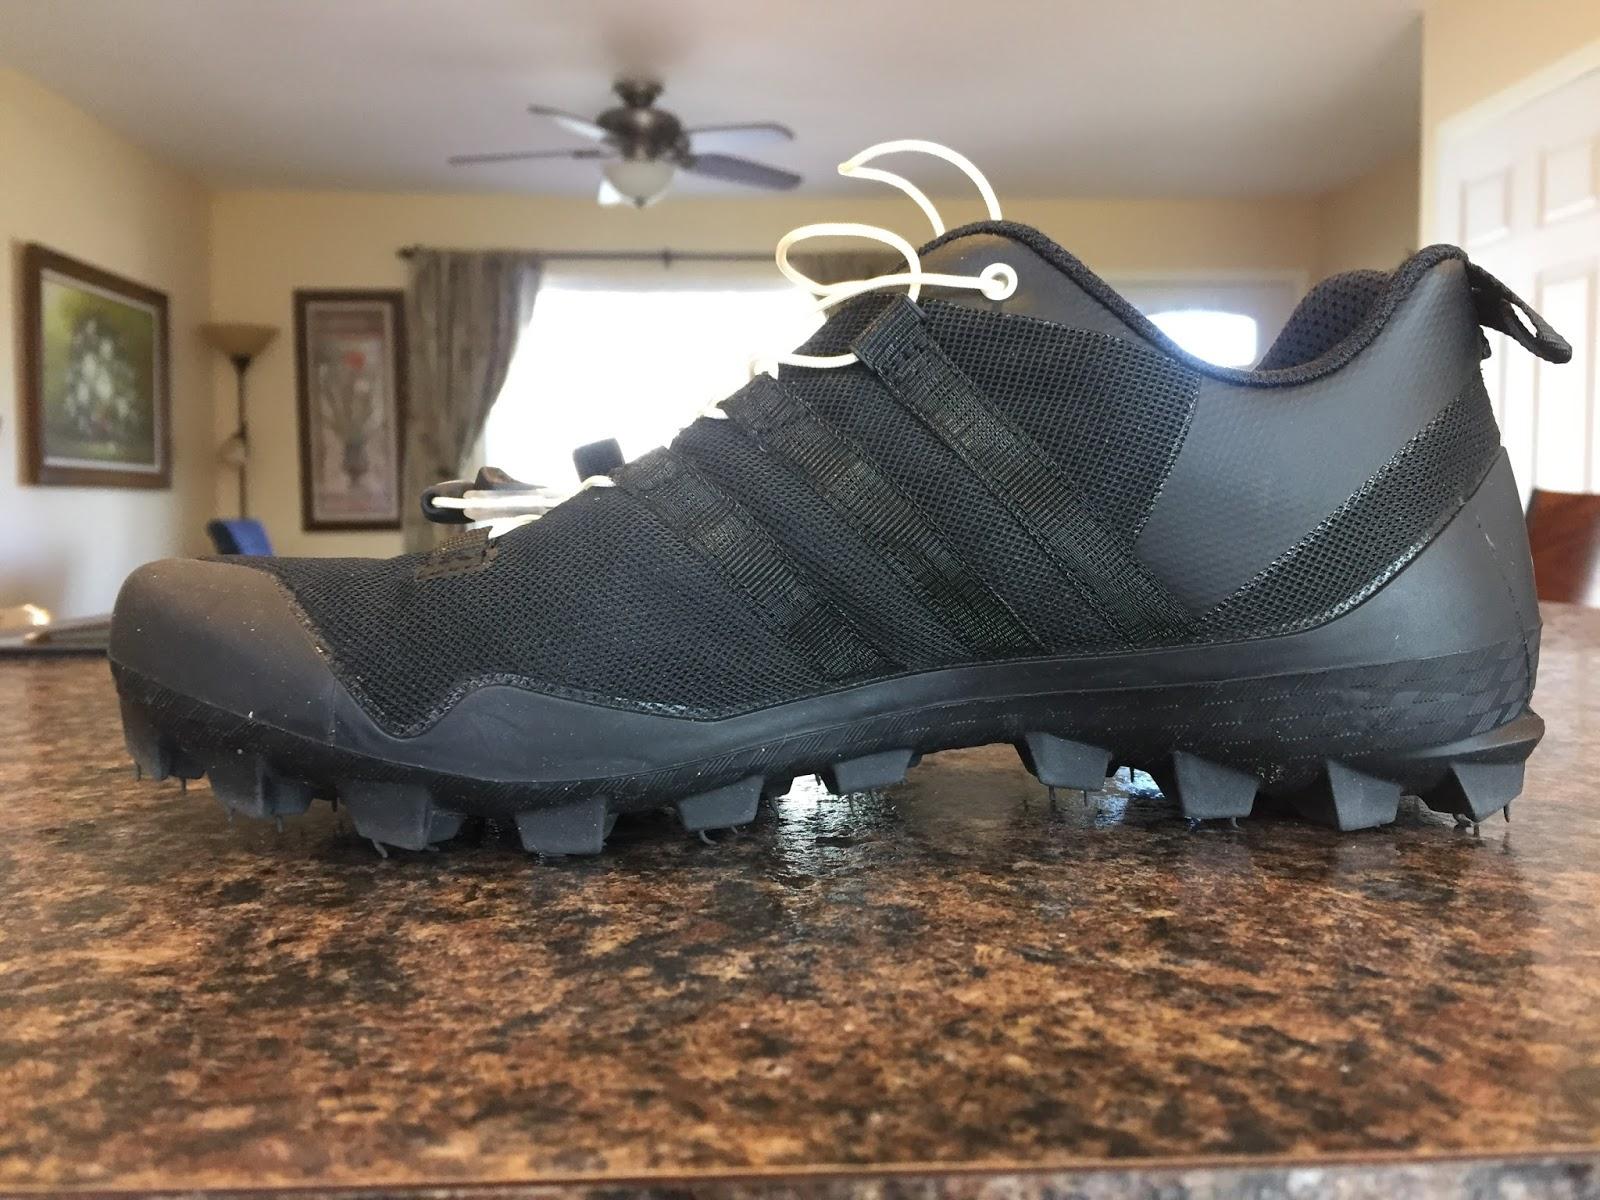 6f1e6f304f2f Road Trail Run  adidas Terrex X King - Taking Traction and ...